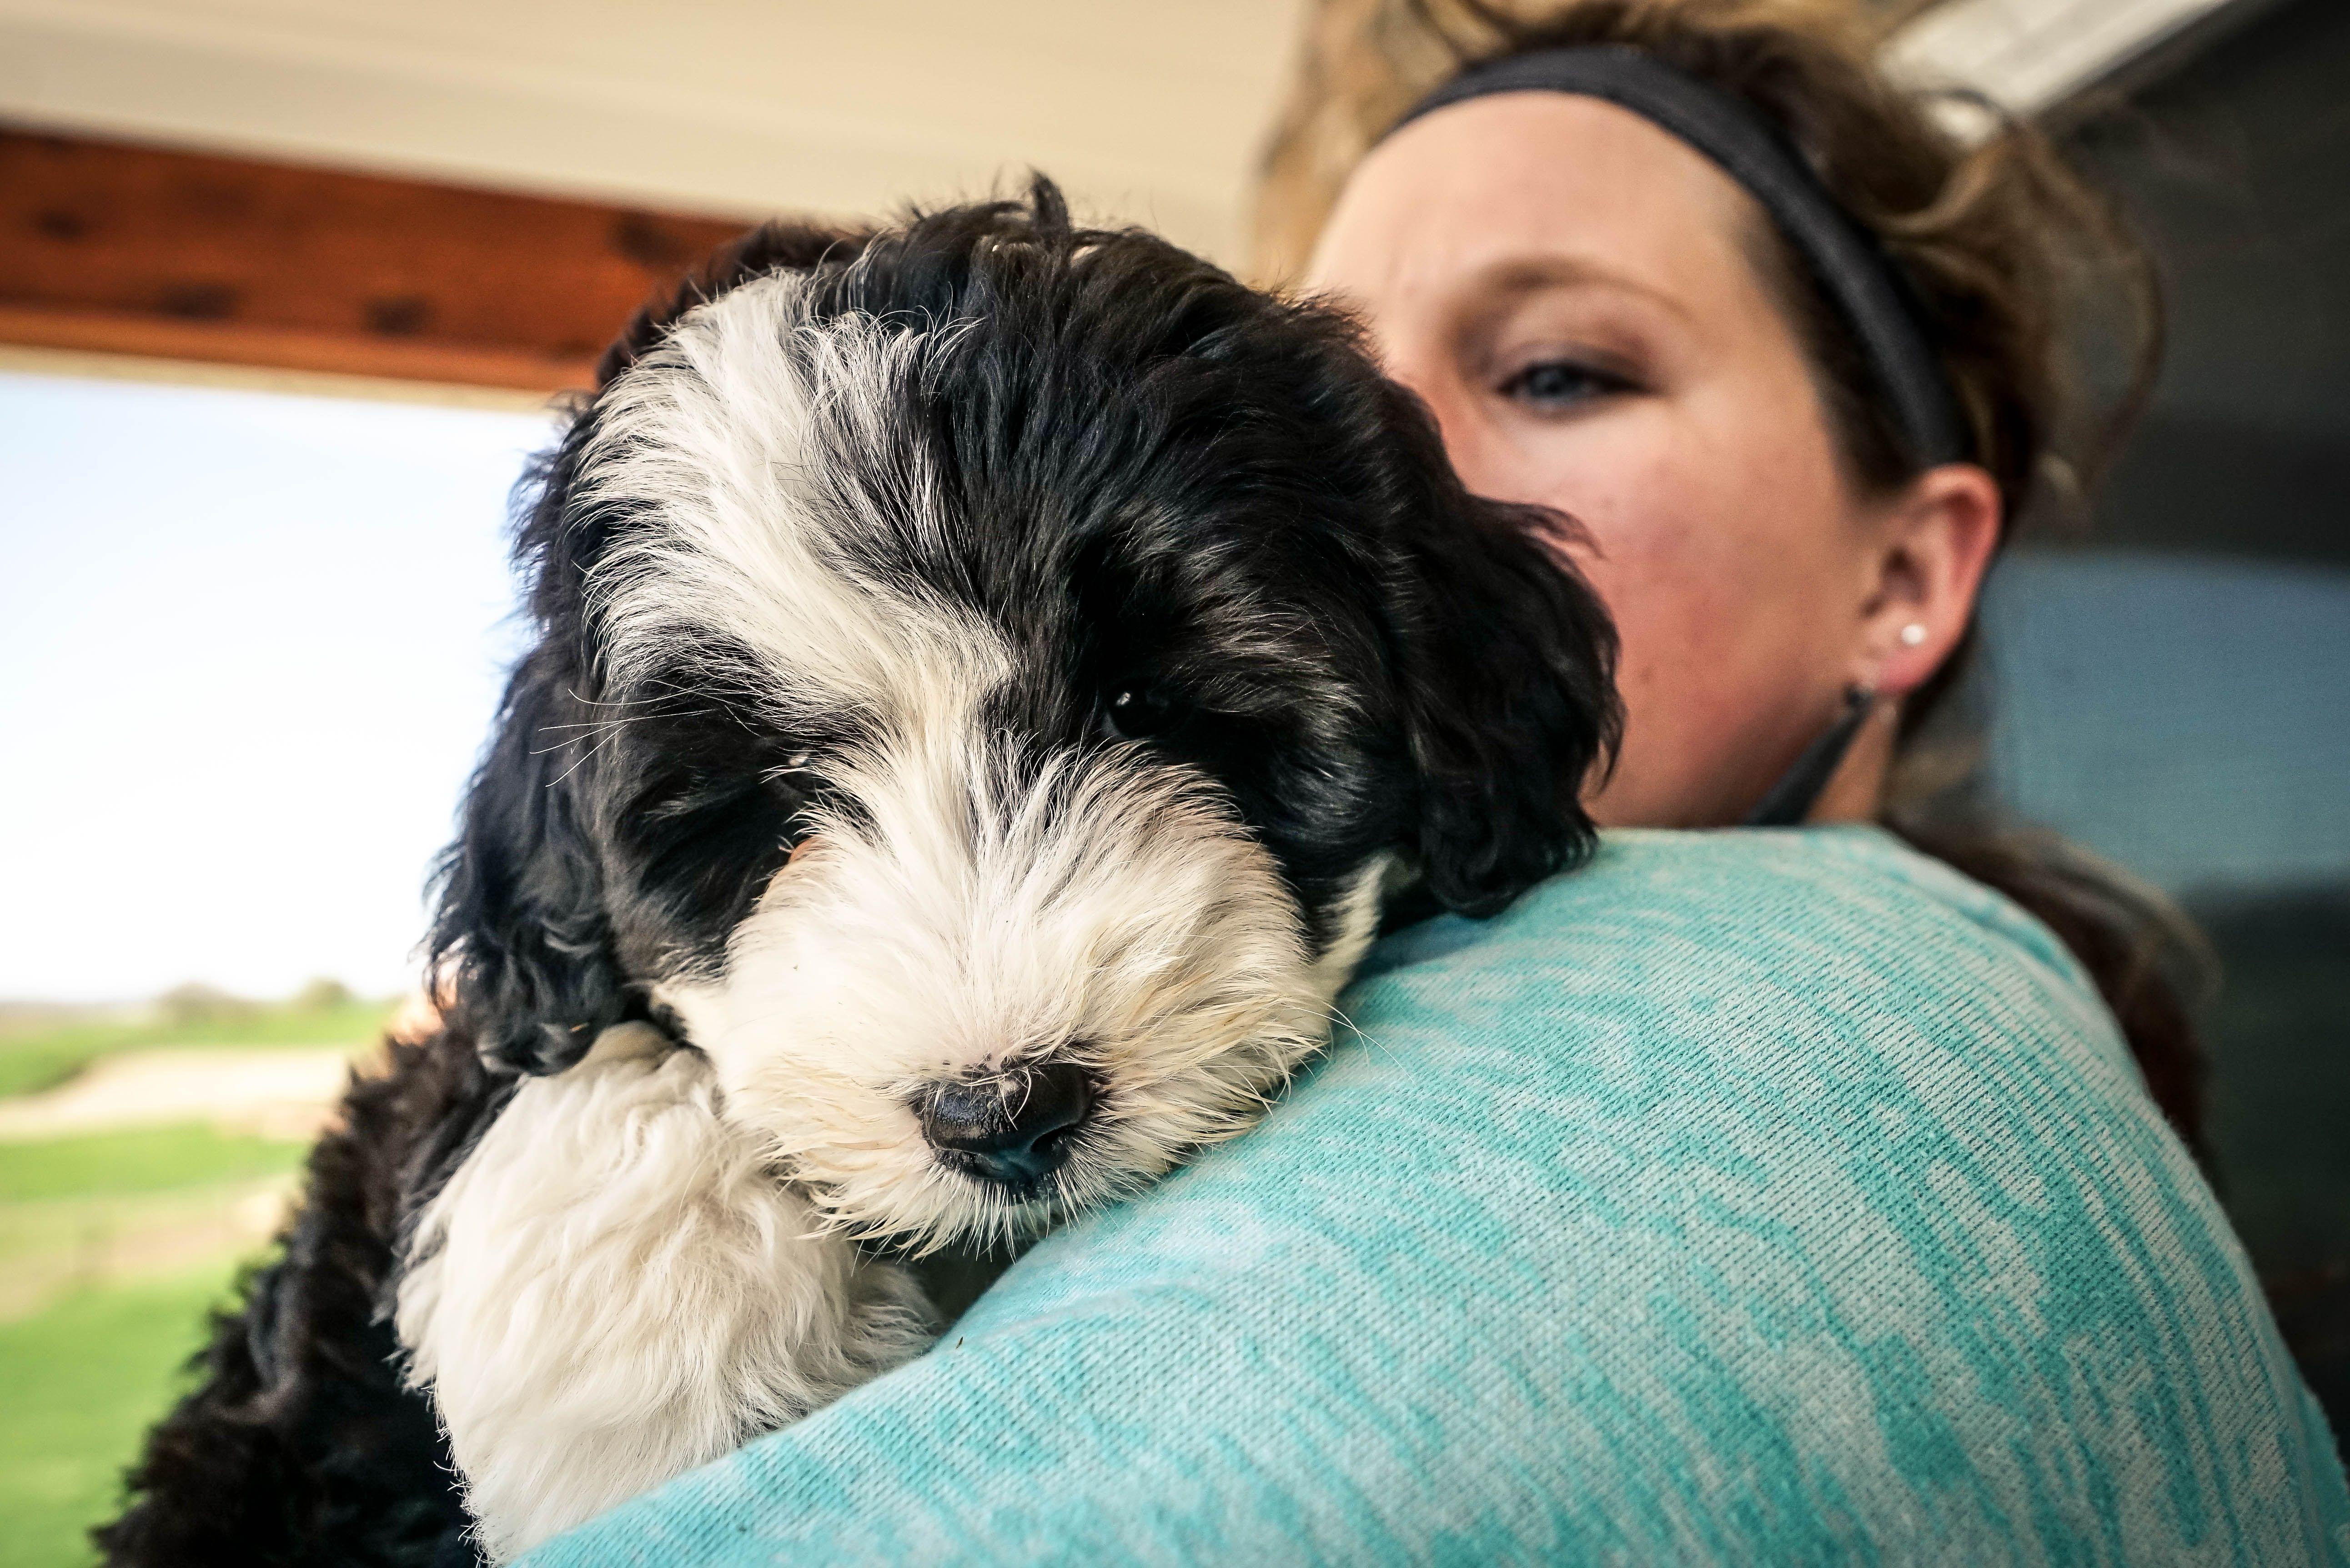 Meet Gracie Mini Sheepadoodle Puppy For Sale In Sugarcreek Ohio Sheepadoodle Sheepadoodlepuppies Ohio Sheepadoodle Puppy Puppies For Sale Sheepadoodle